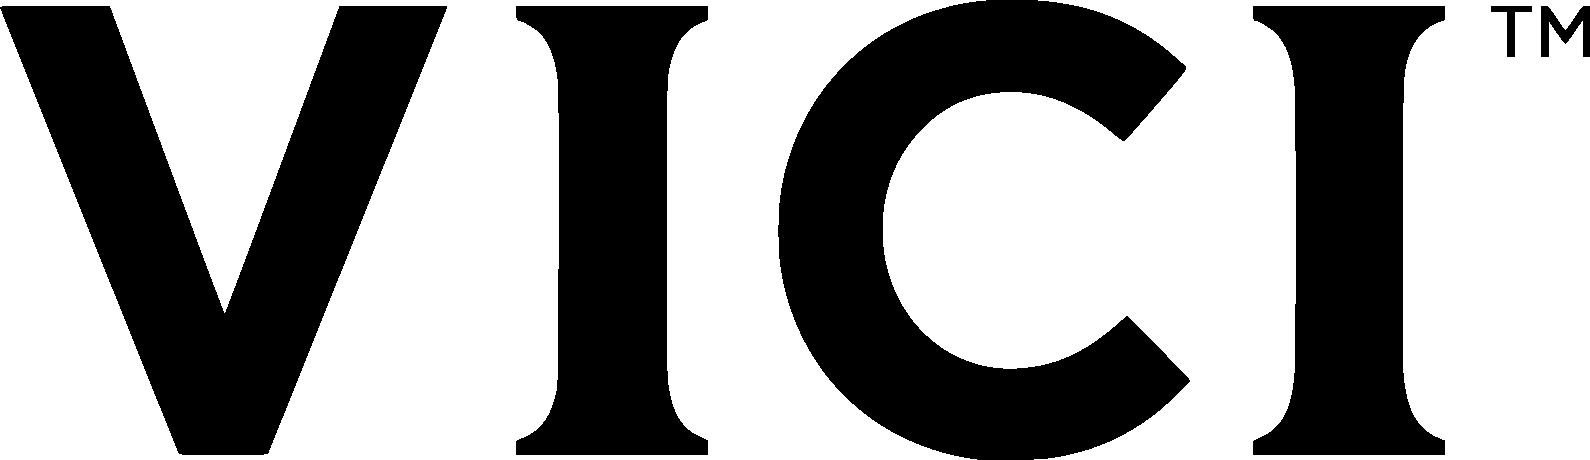 Vici Properties Logo png